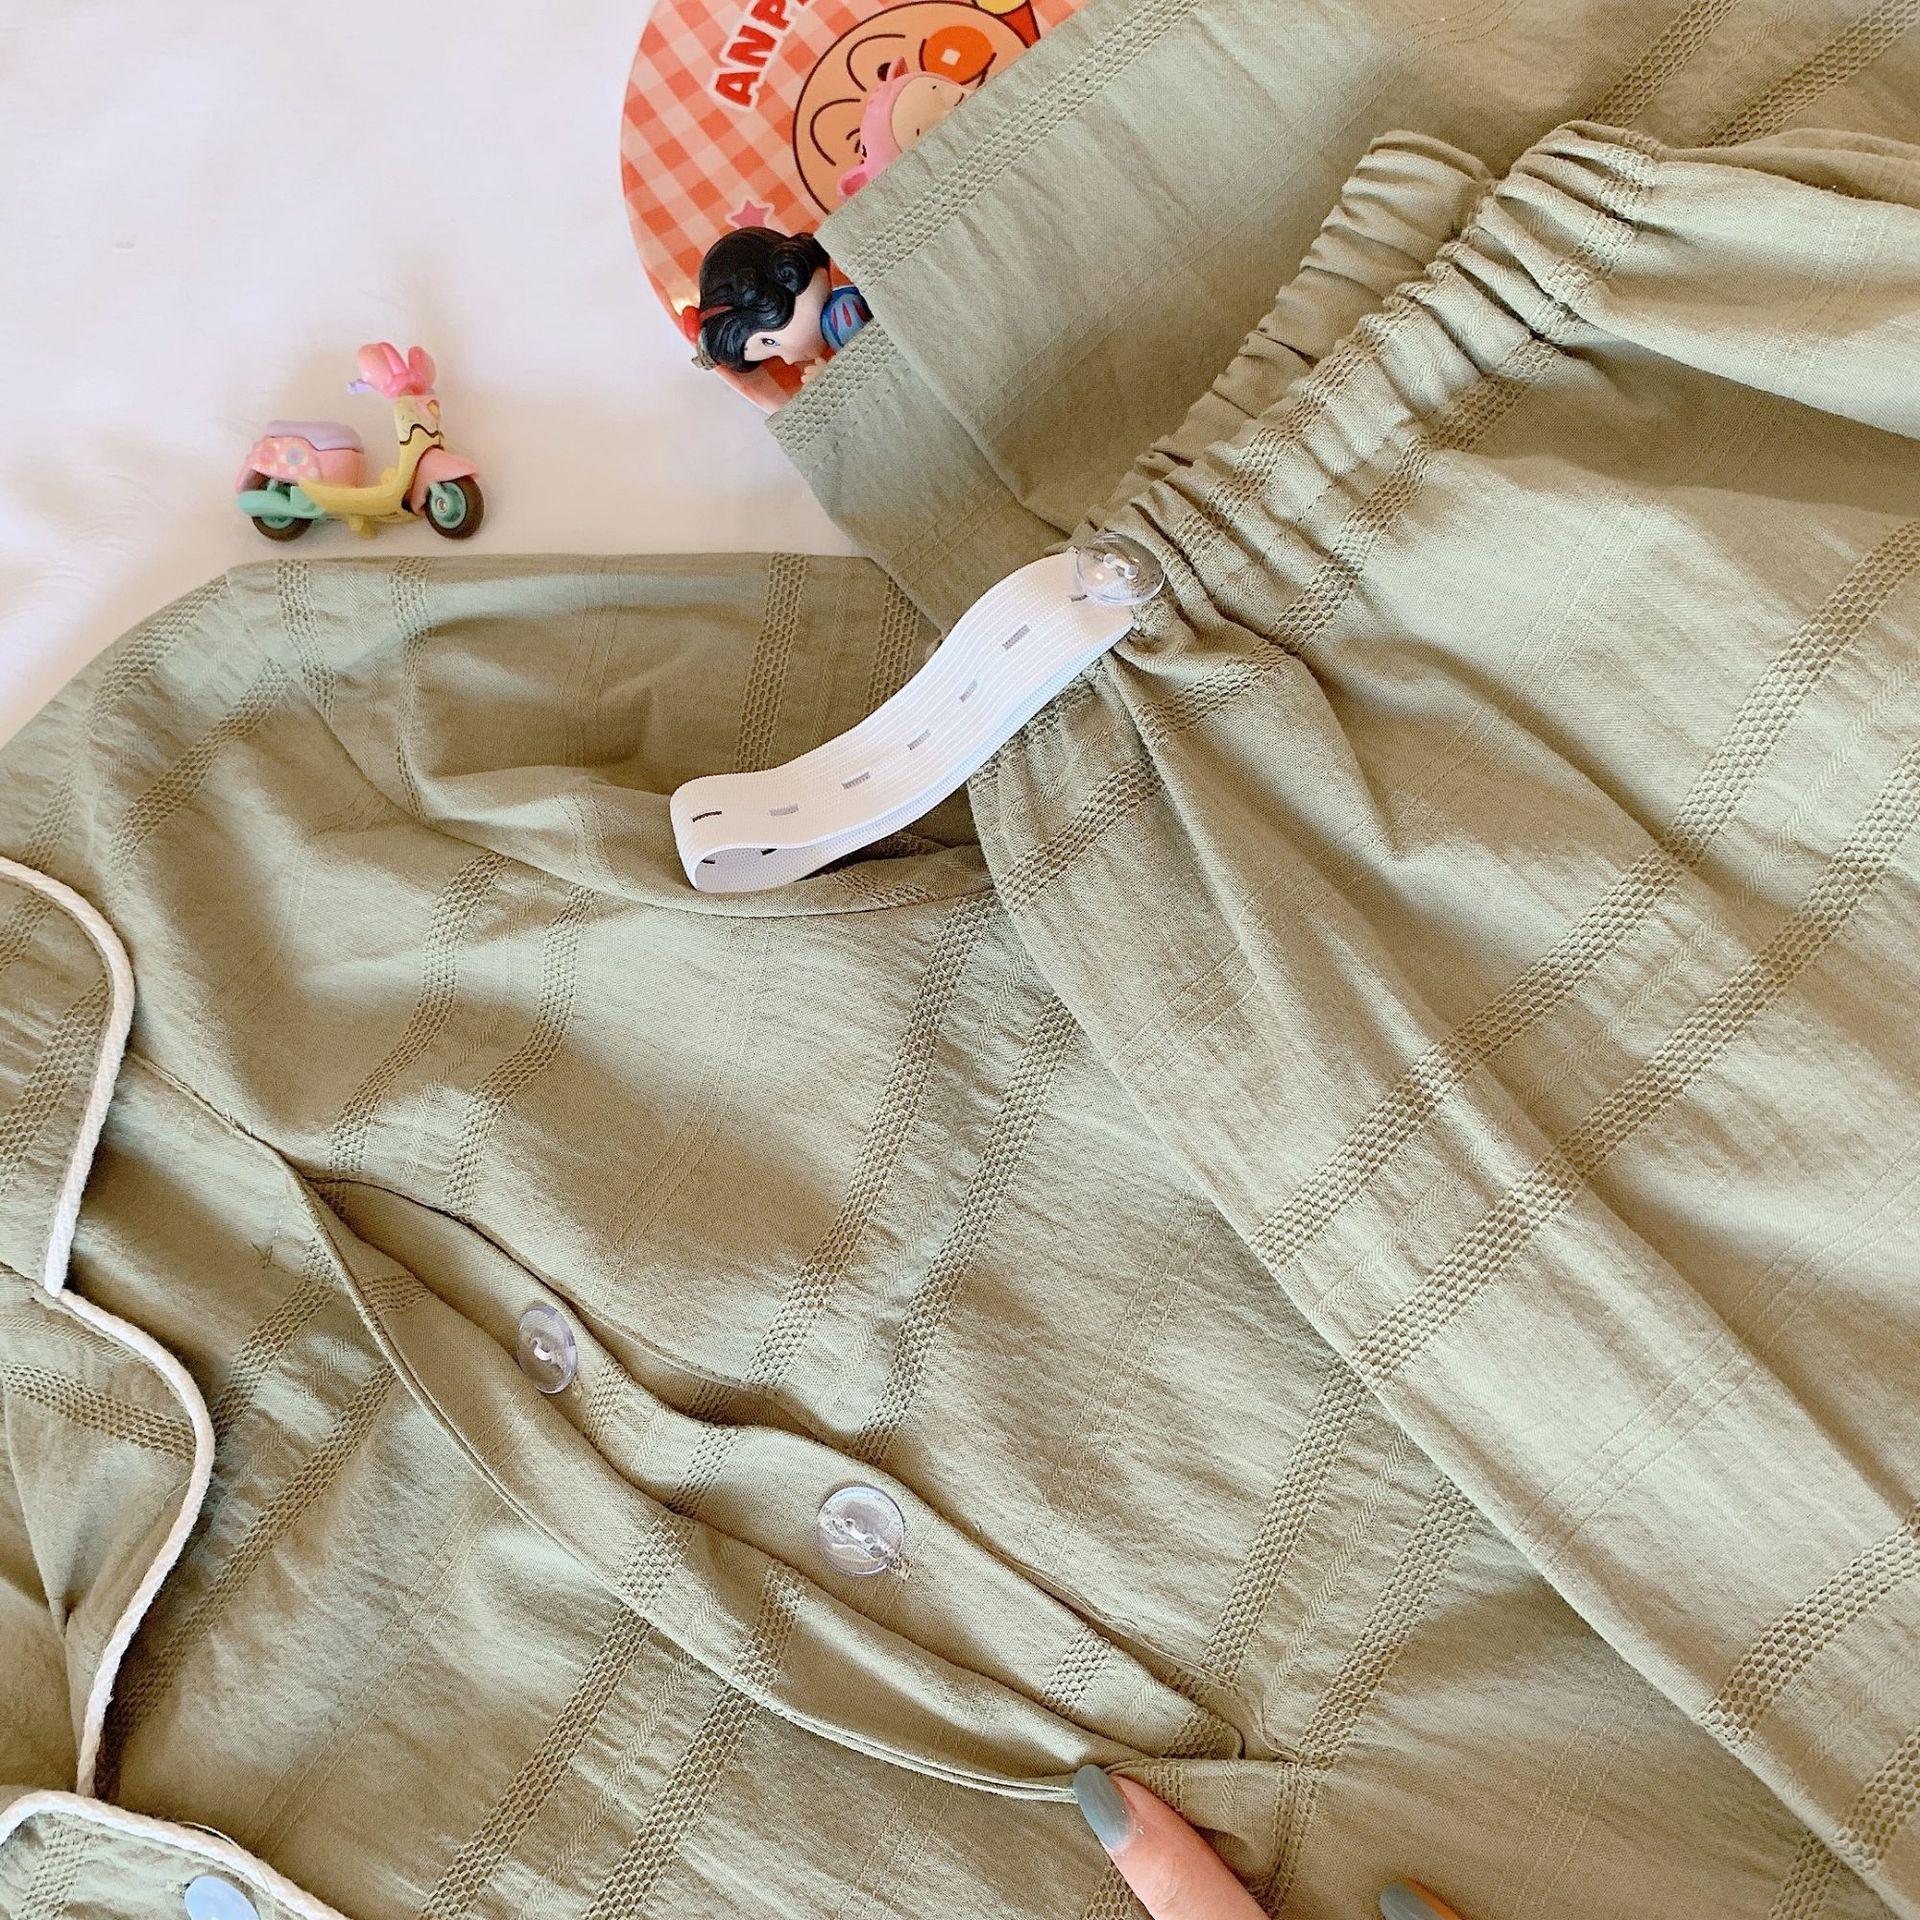 Fdfklak Women's Nightie For Nursing Pajamas Maternity Clothes Set Pregnant Pyjama Spring Autumn Long Sleeve Pregnancy Pijamas enlarge